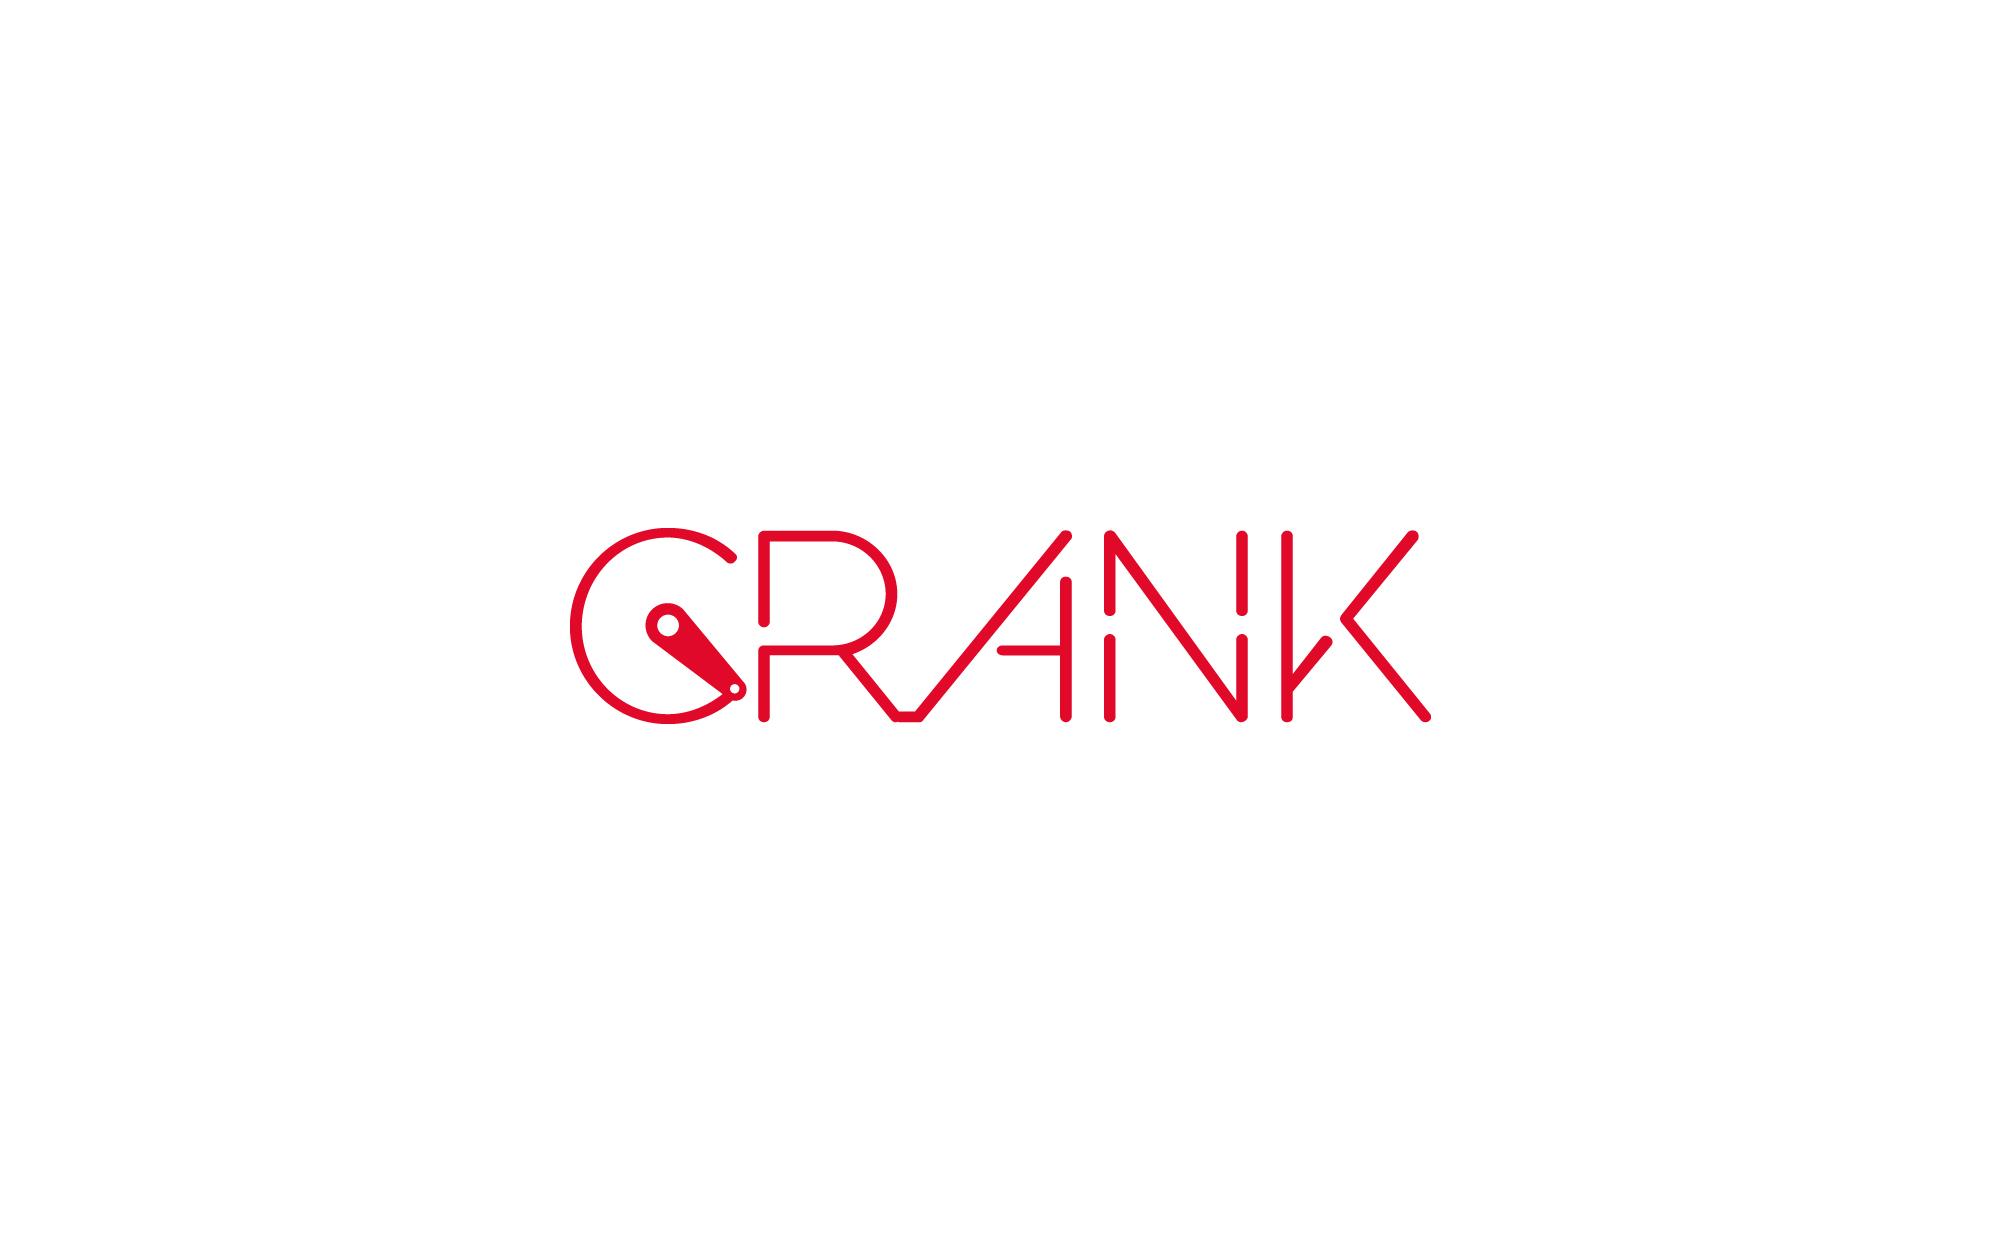 crank_branding_matthew_pomorski_kent_graphic_design_2